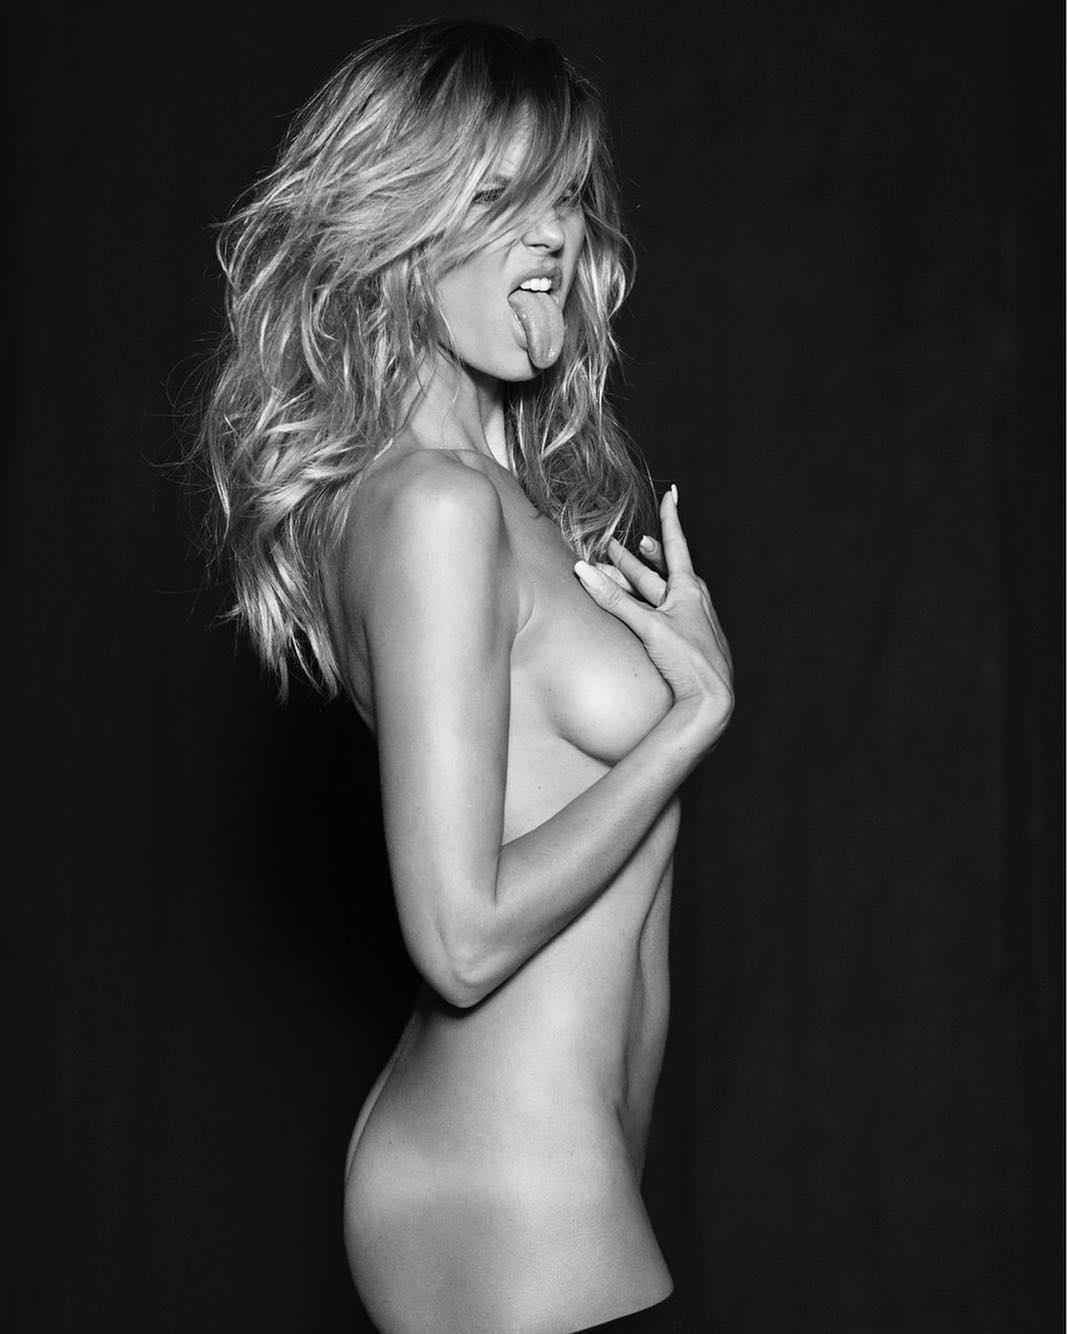 Heidi Klum Nide photo 21